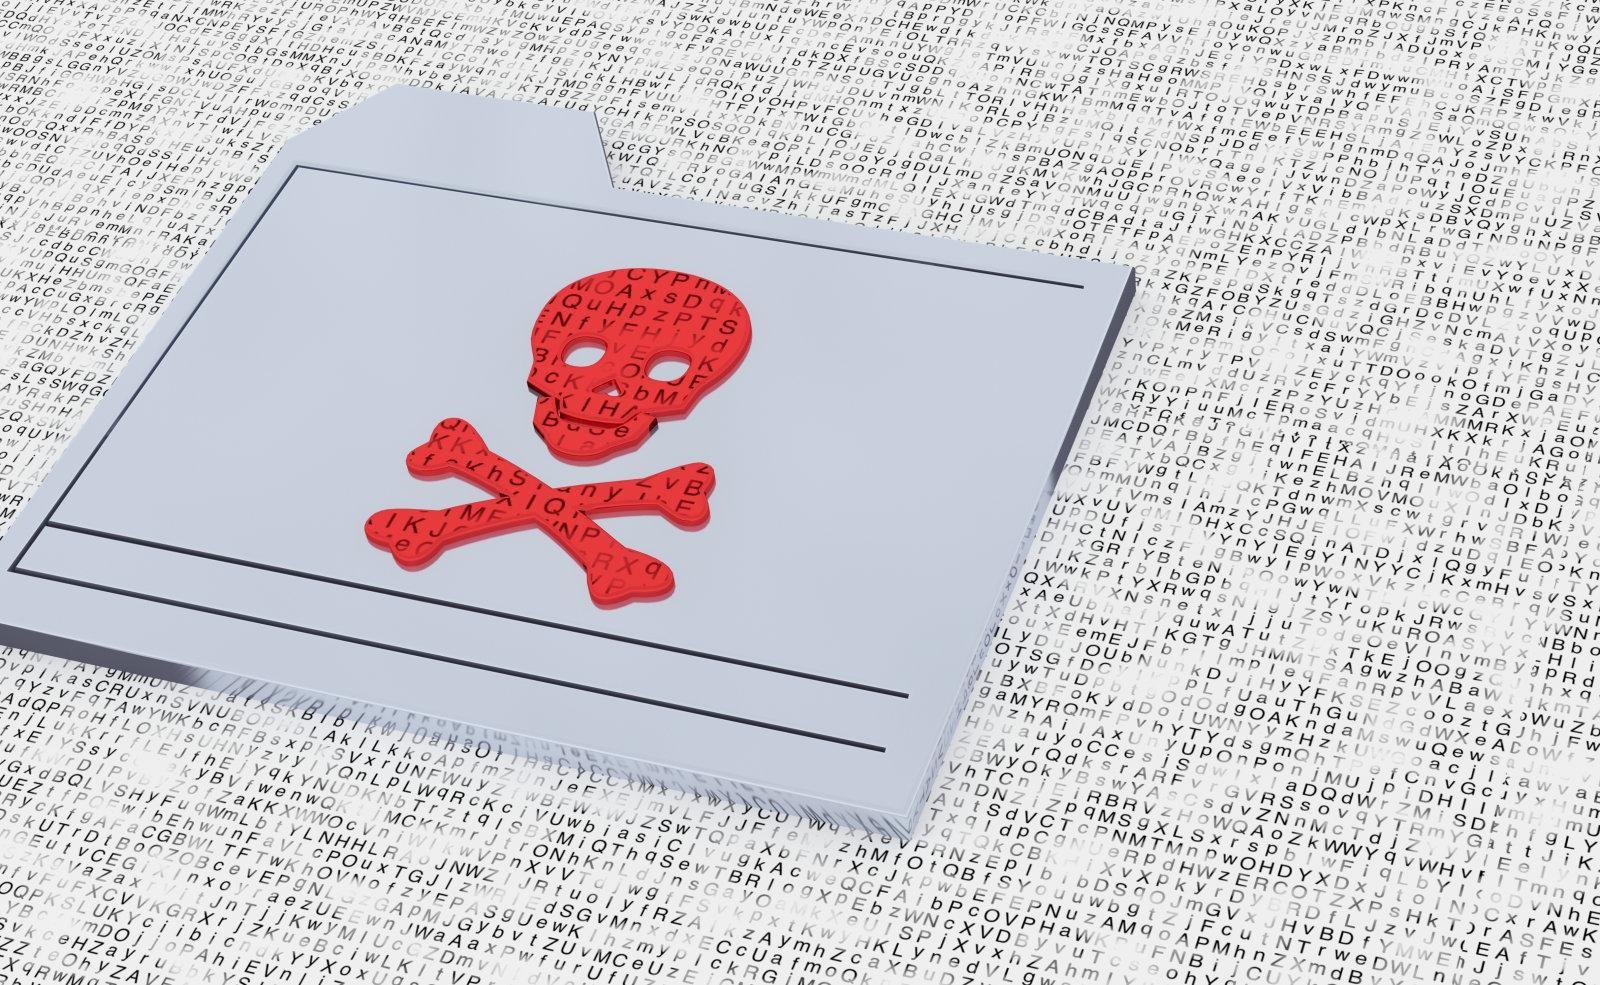 NotPetya: Devastating Cyber Attack That Caused Ultimate Turmoil